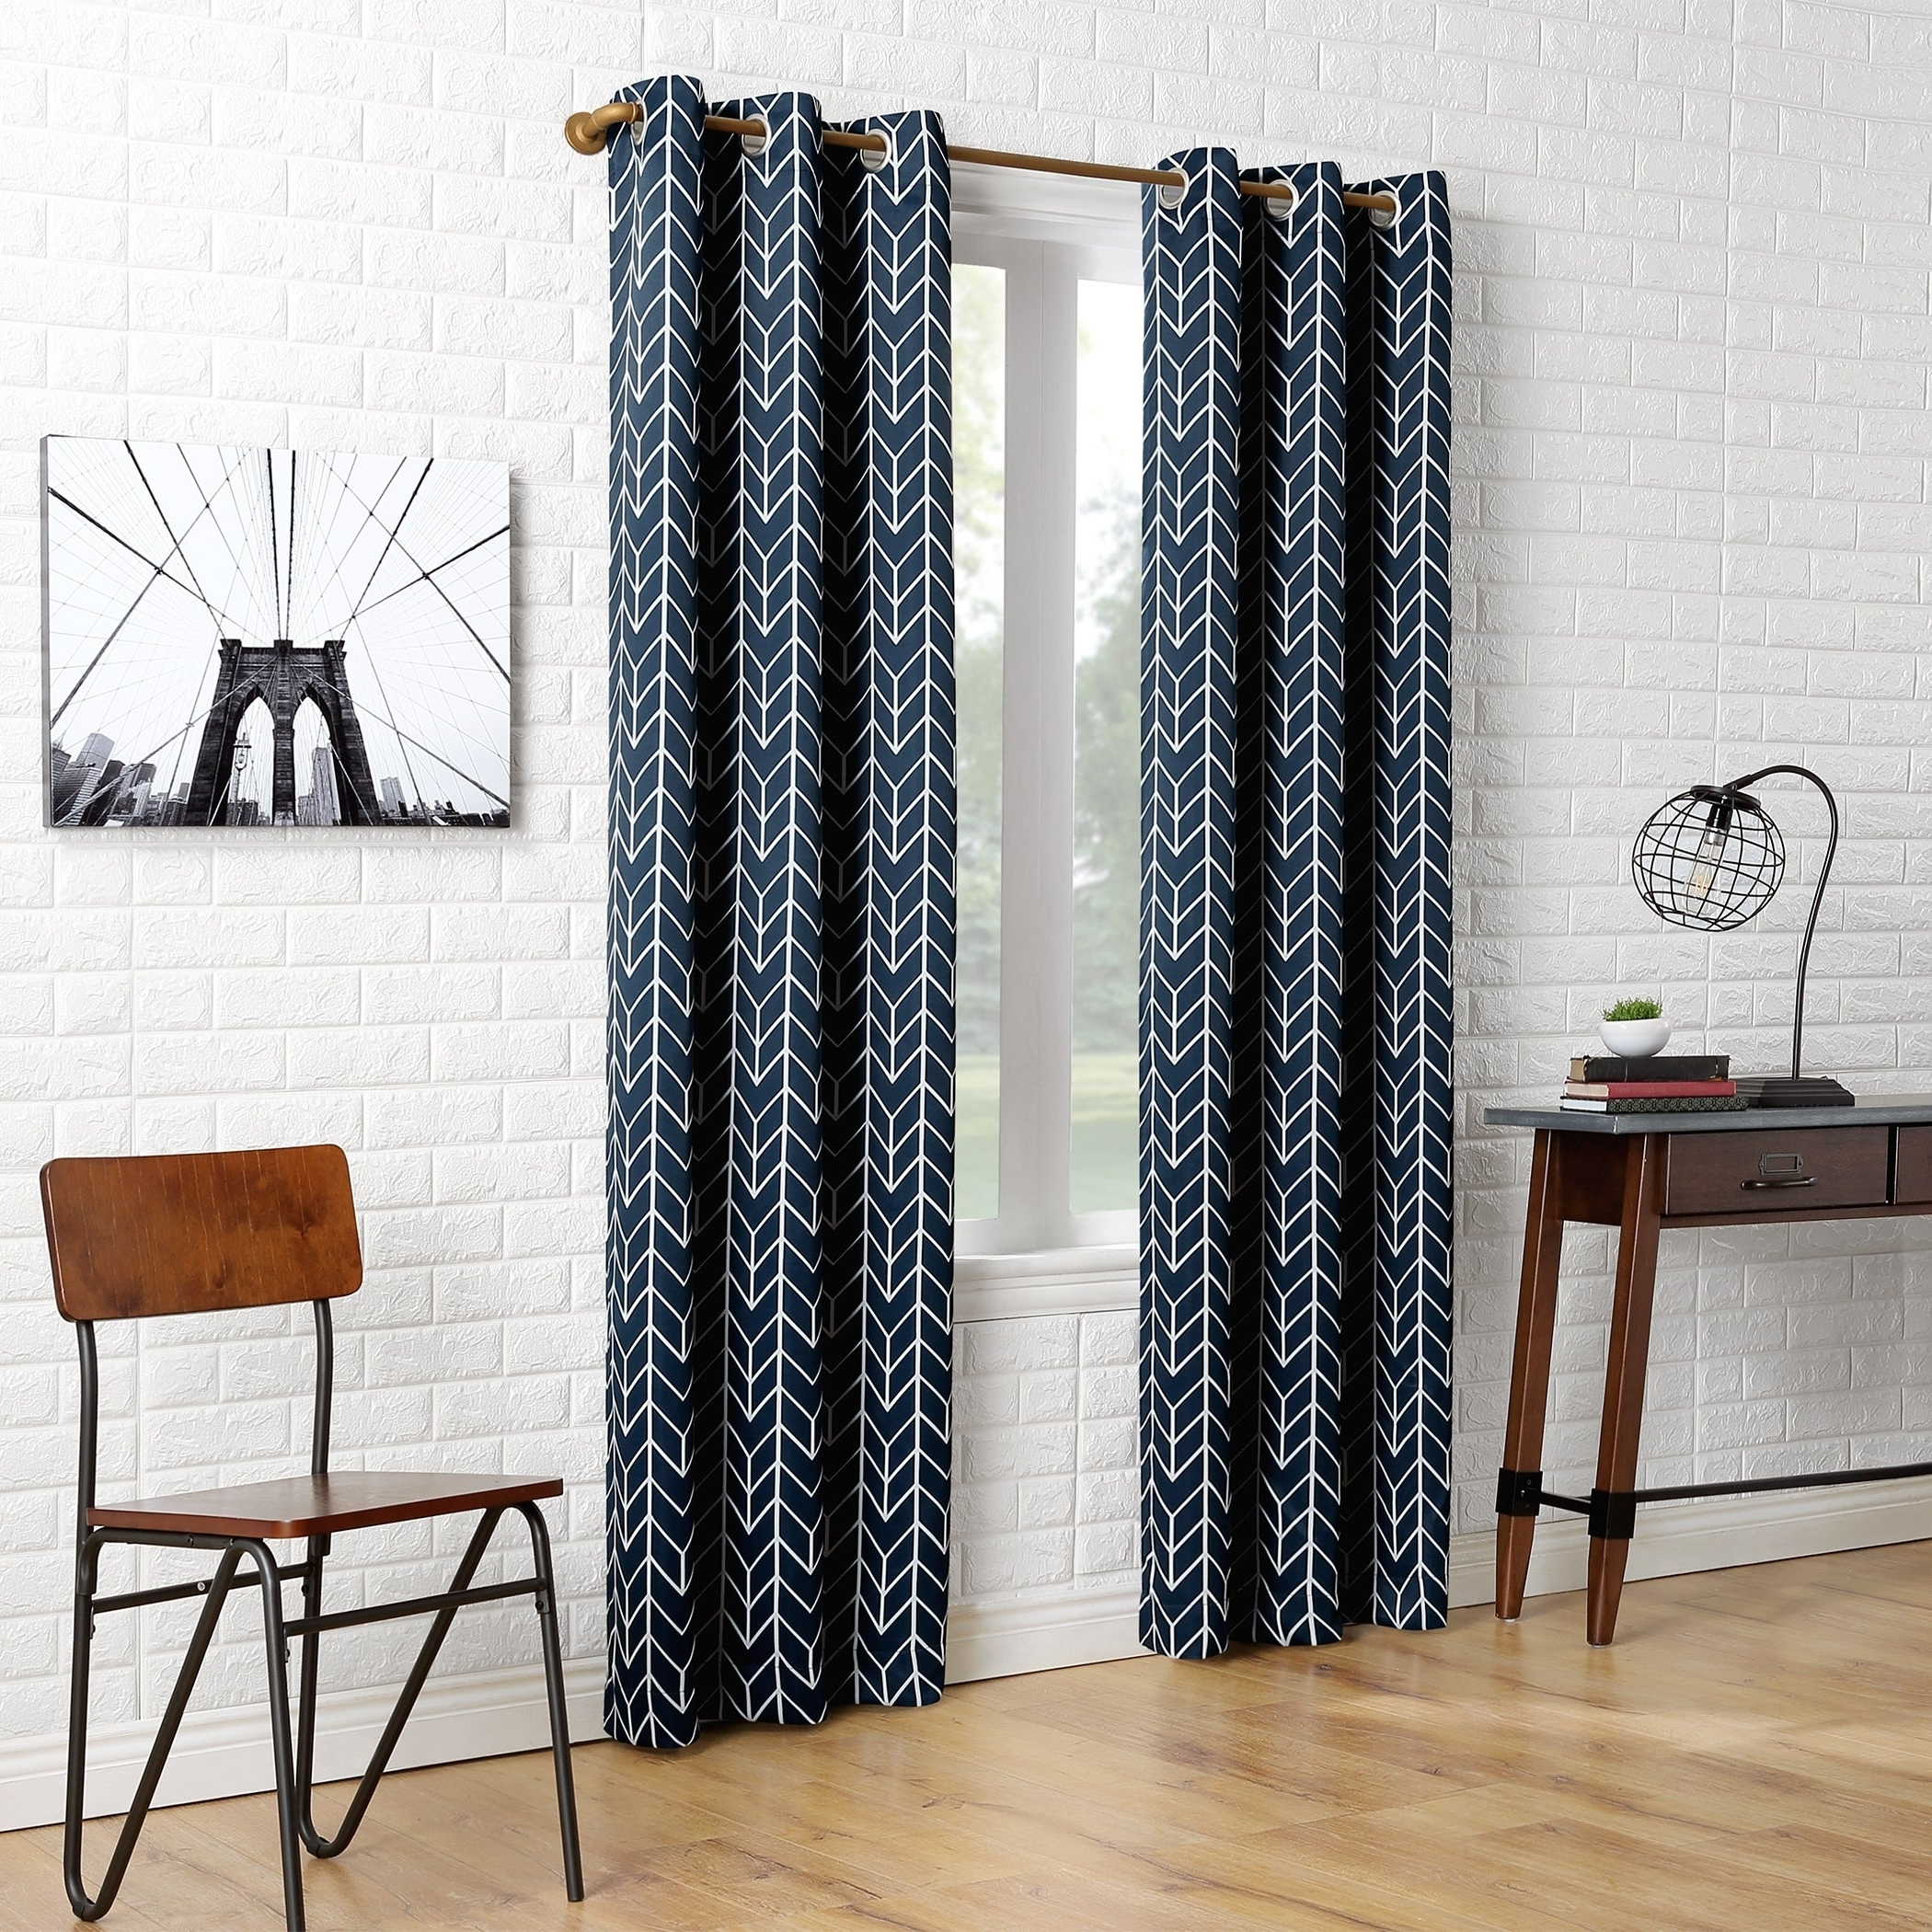 Sun Zero Kenwood Chevron Blackout Grommet Curtain Panel With Best And Newest Chevron Blackout Grommet Curtain Panels (View 16 of 20)